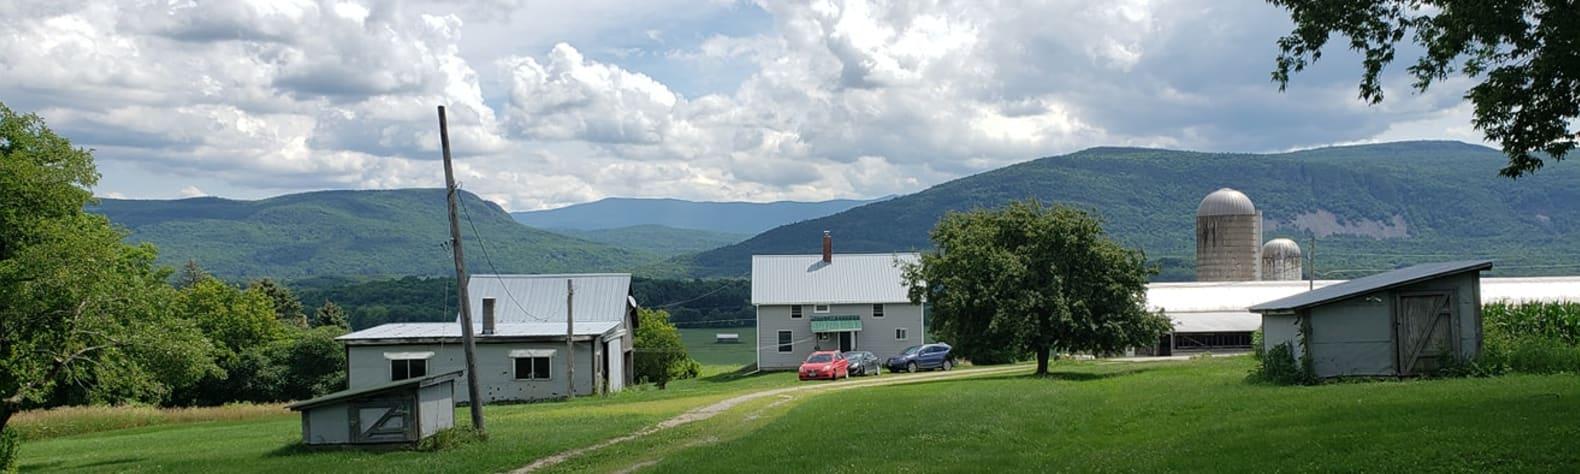 Scenic Root Farm